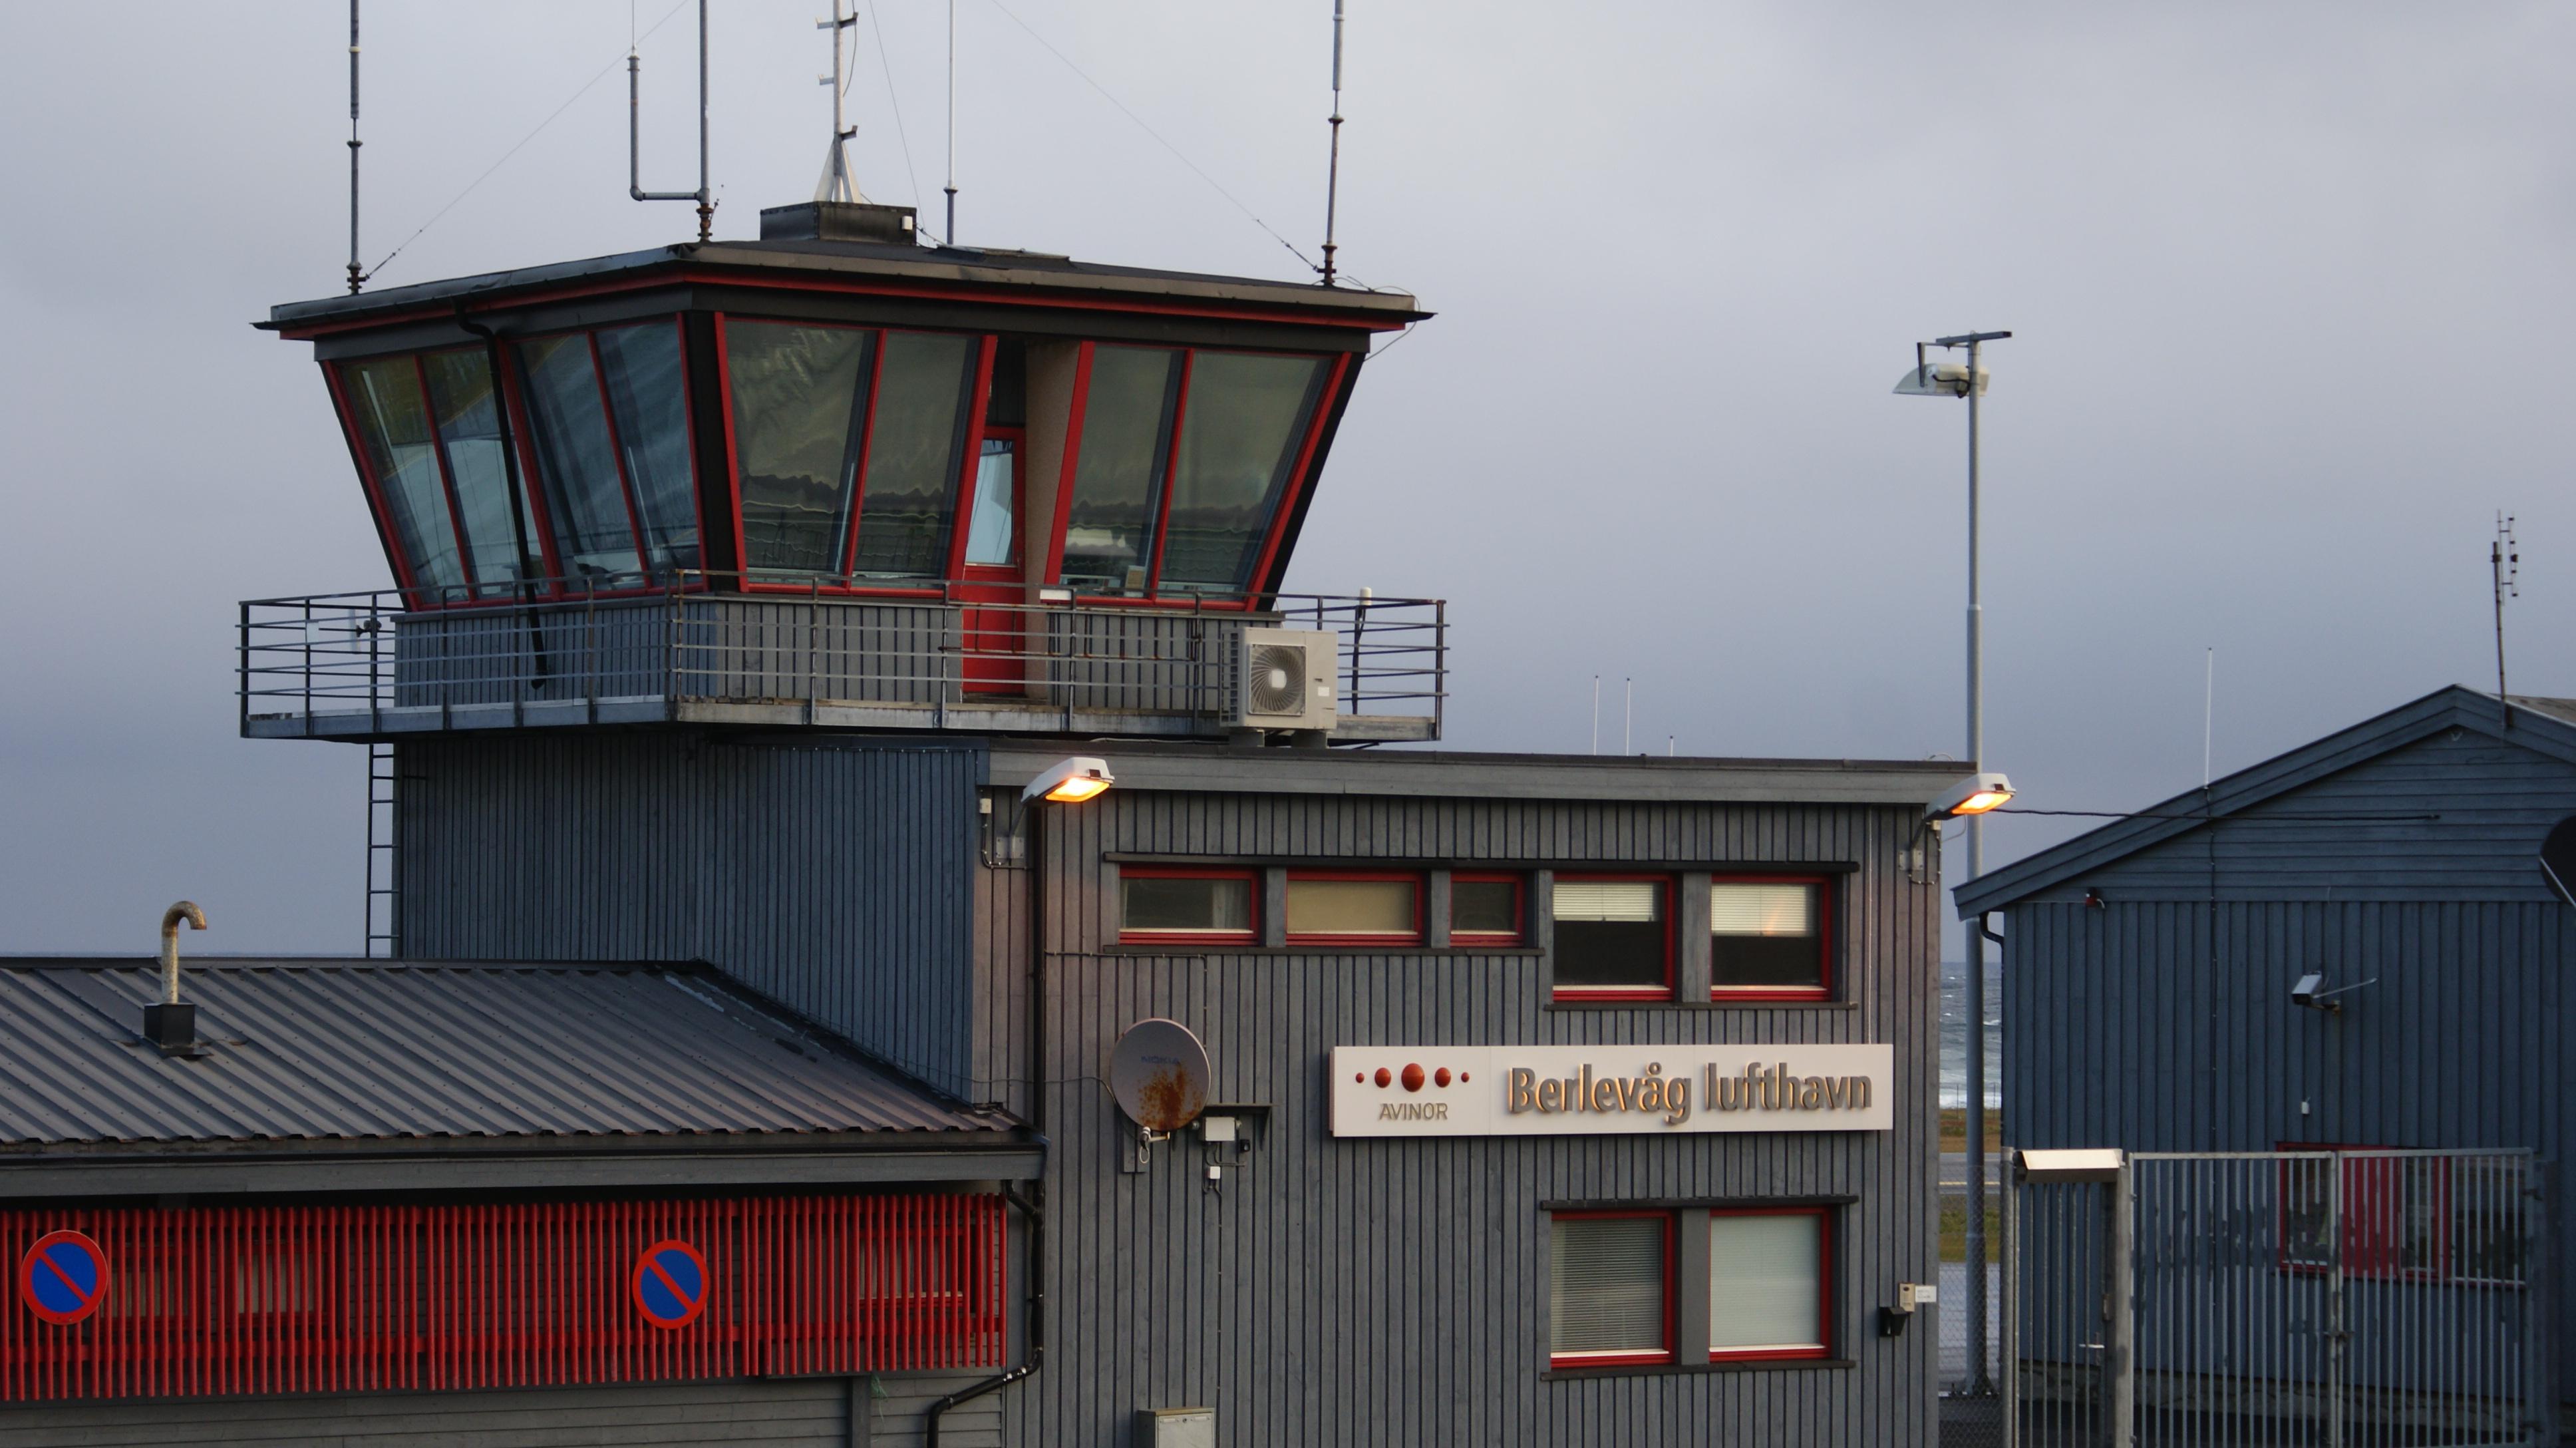 Singel I Berlevåg : Speed dating i lyngdal : Hovikoglier